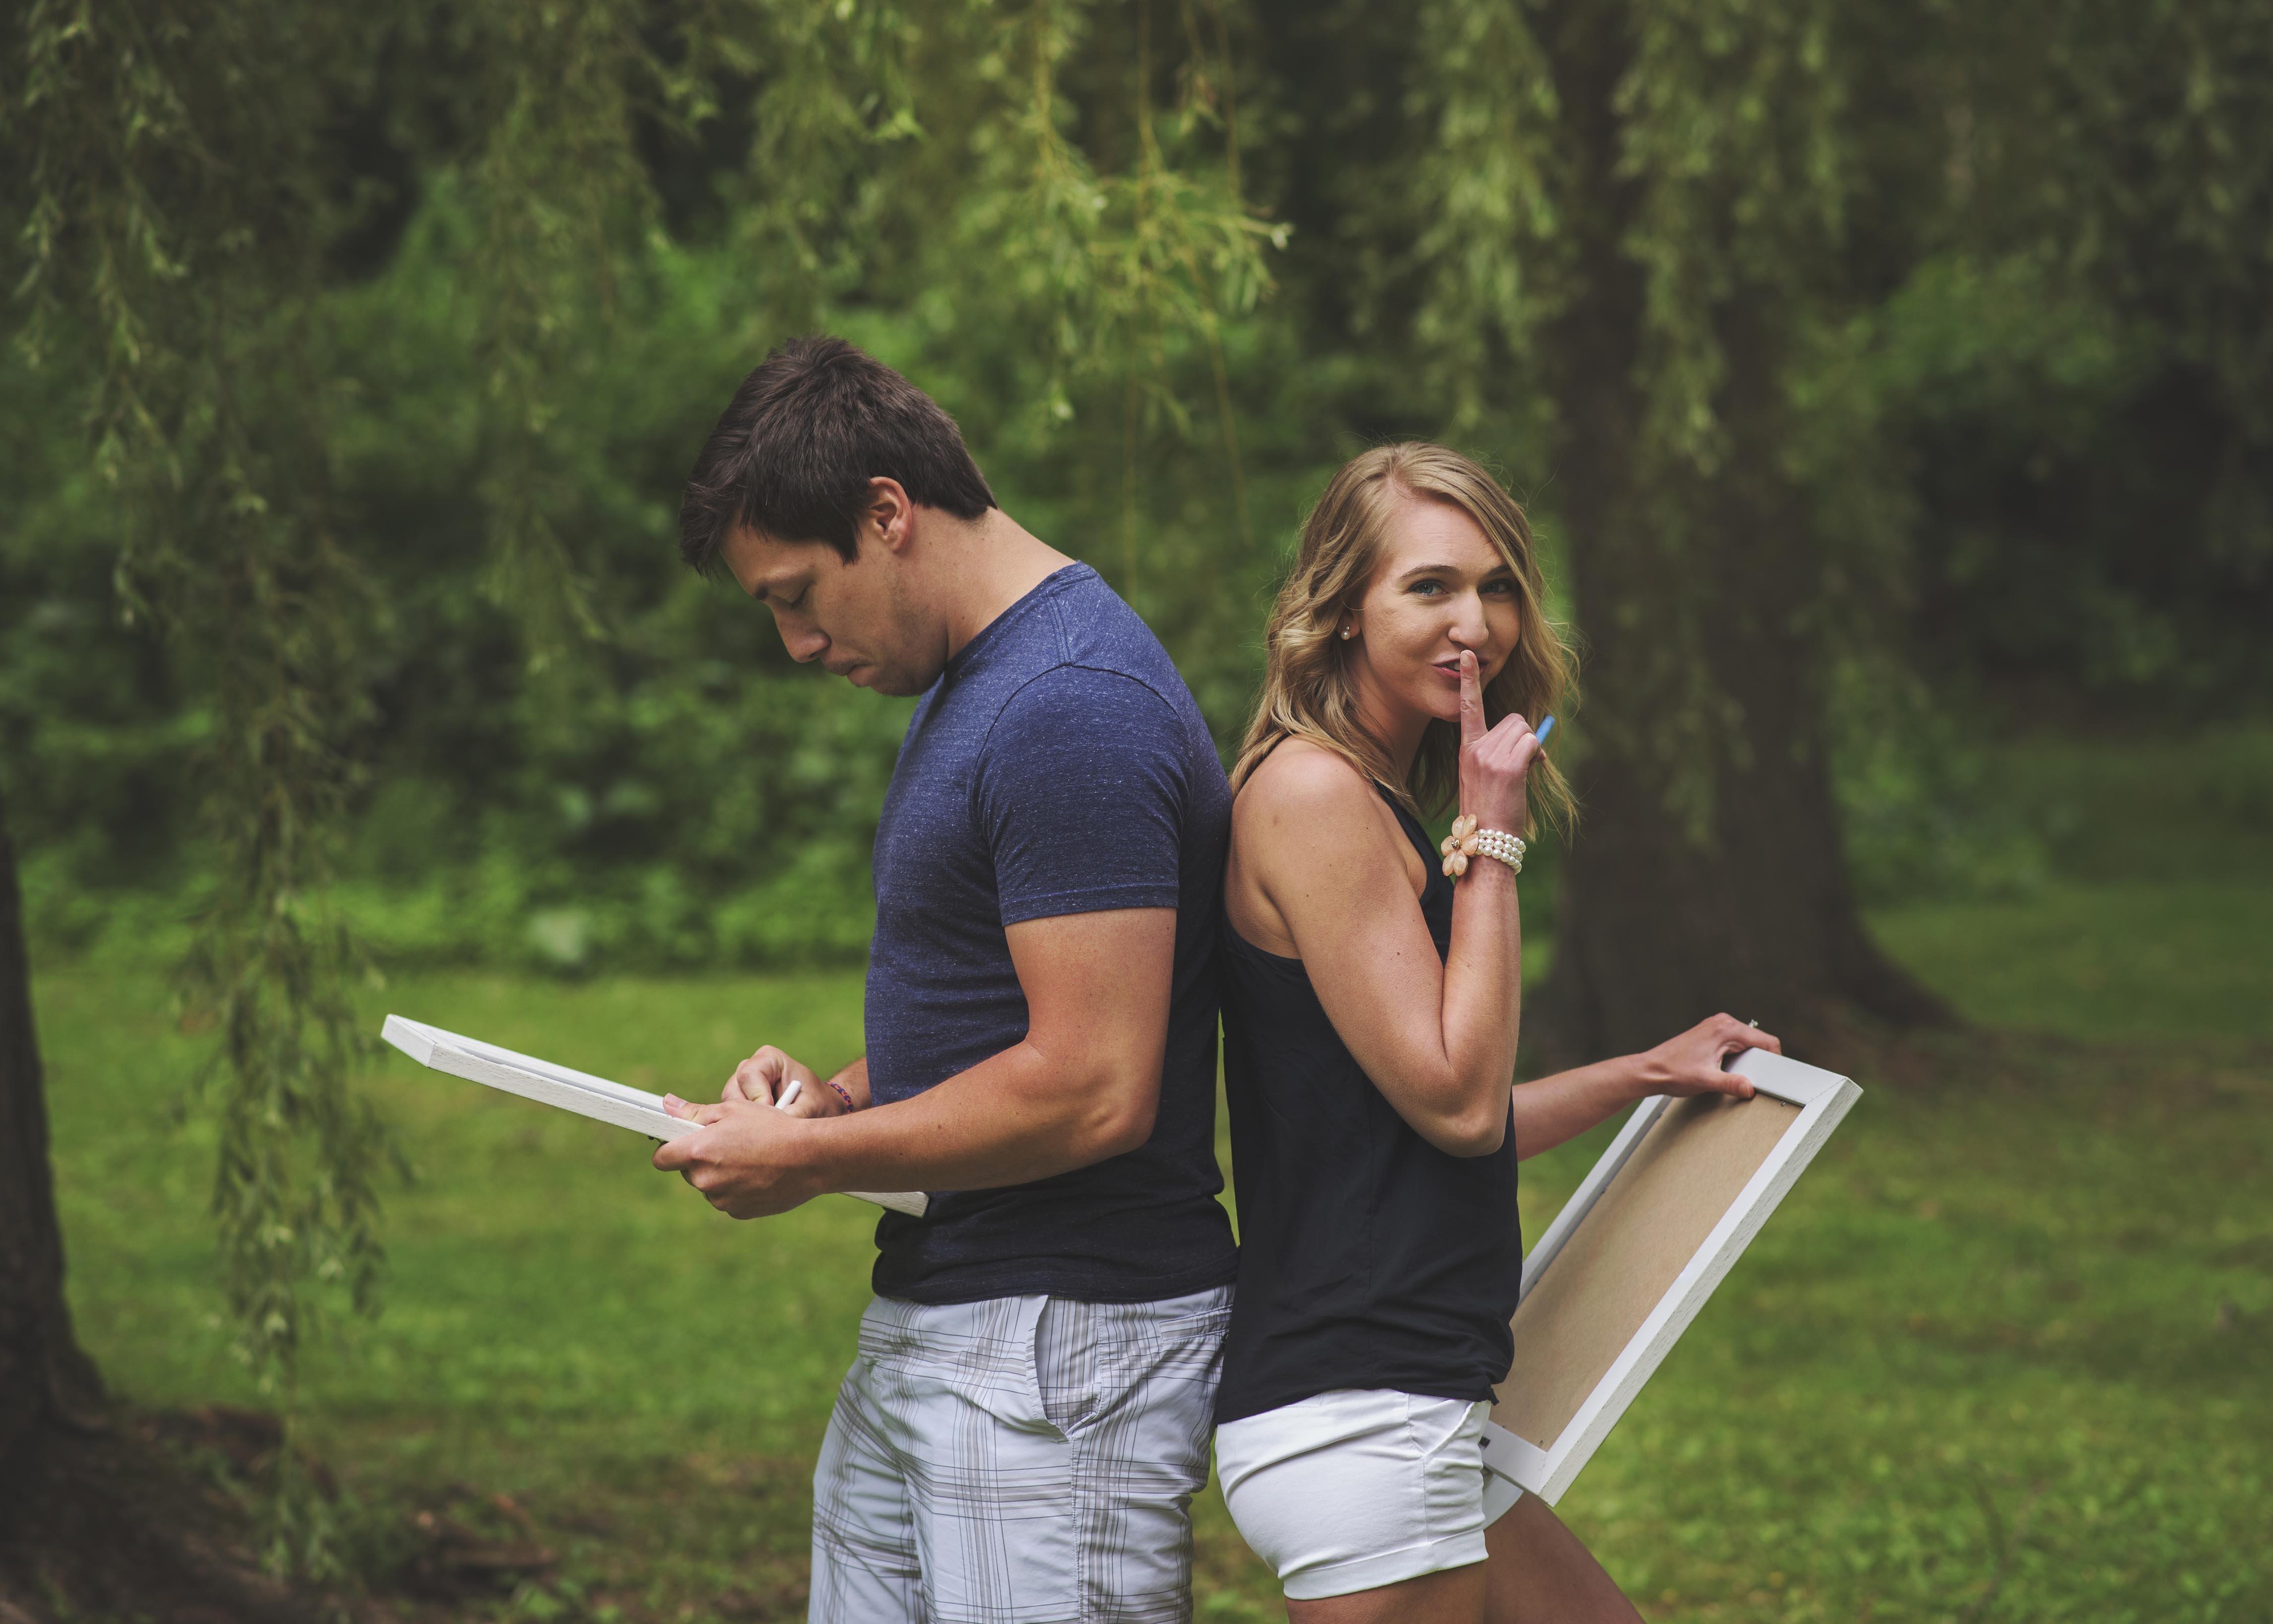 Bri Dow organized a photo shoot to surprise her husband Brandon with herpregnancy news.